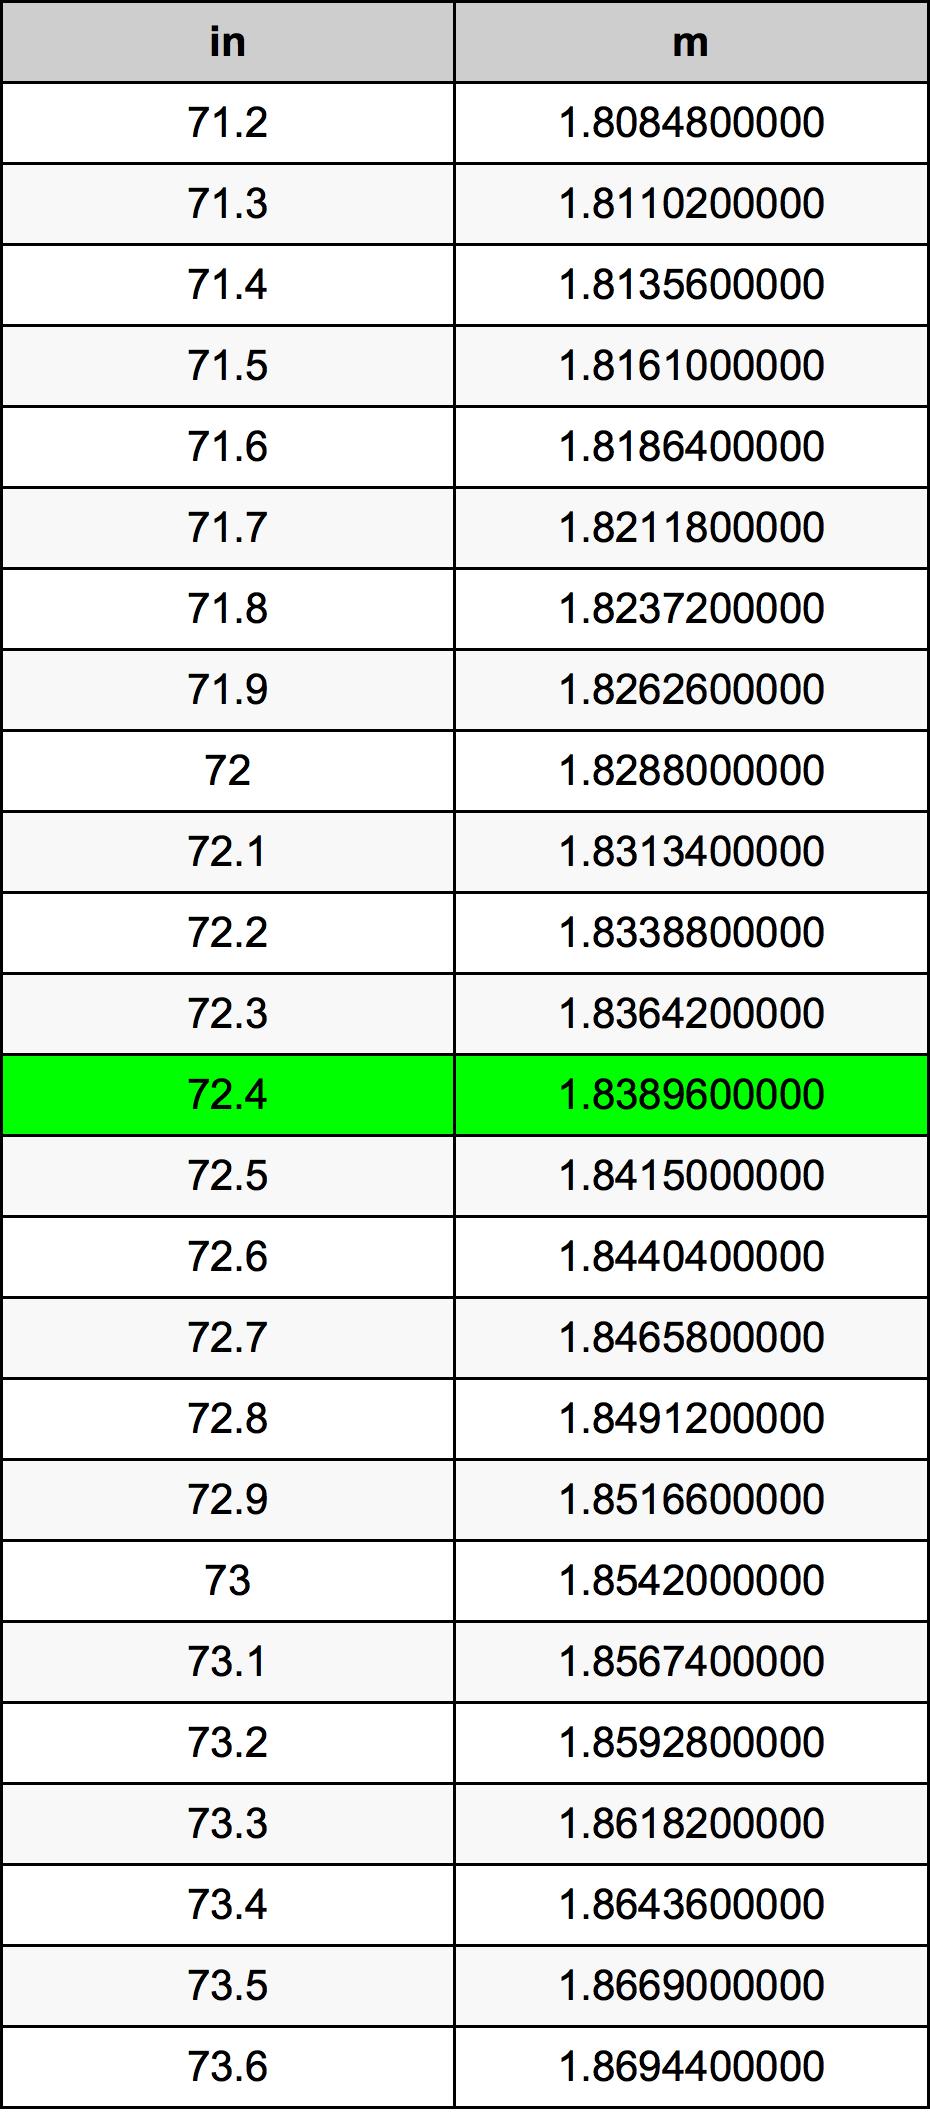 72.4 Inch konverteringstabell